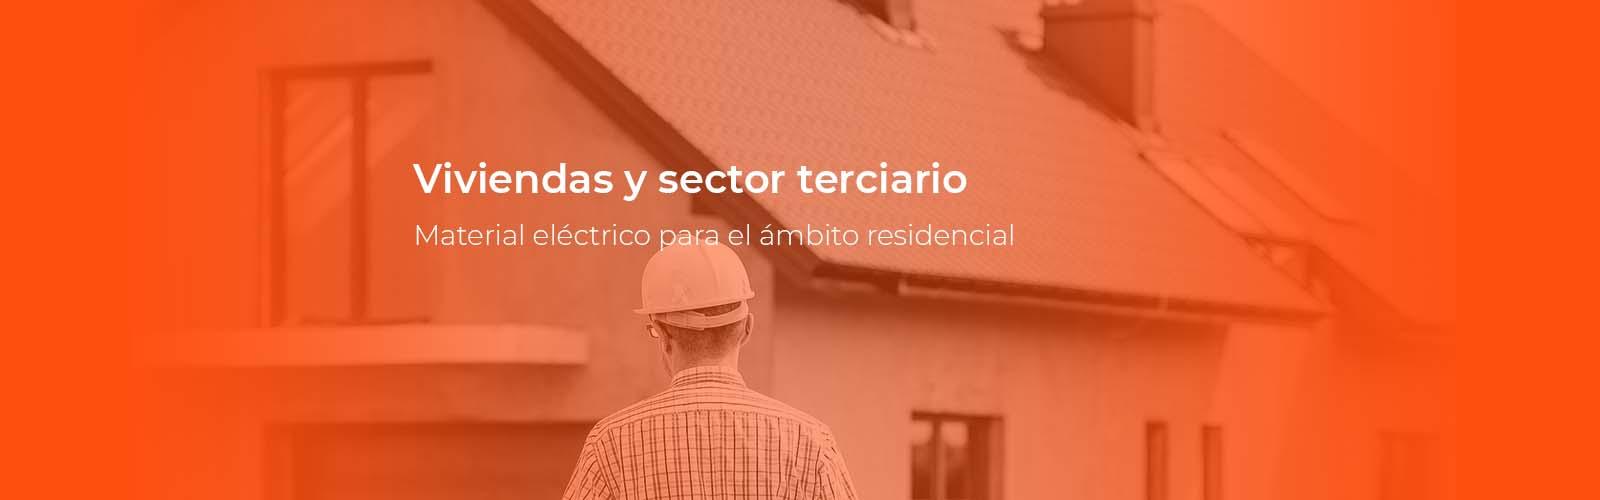 Material eléctrico para viviendas